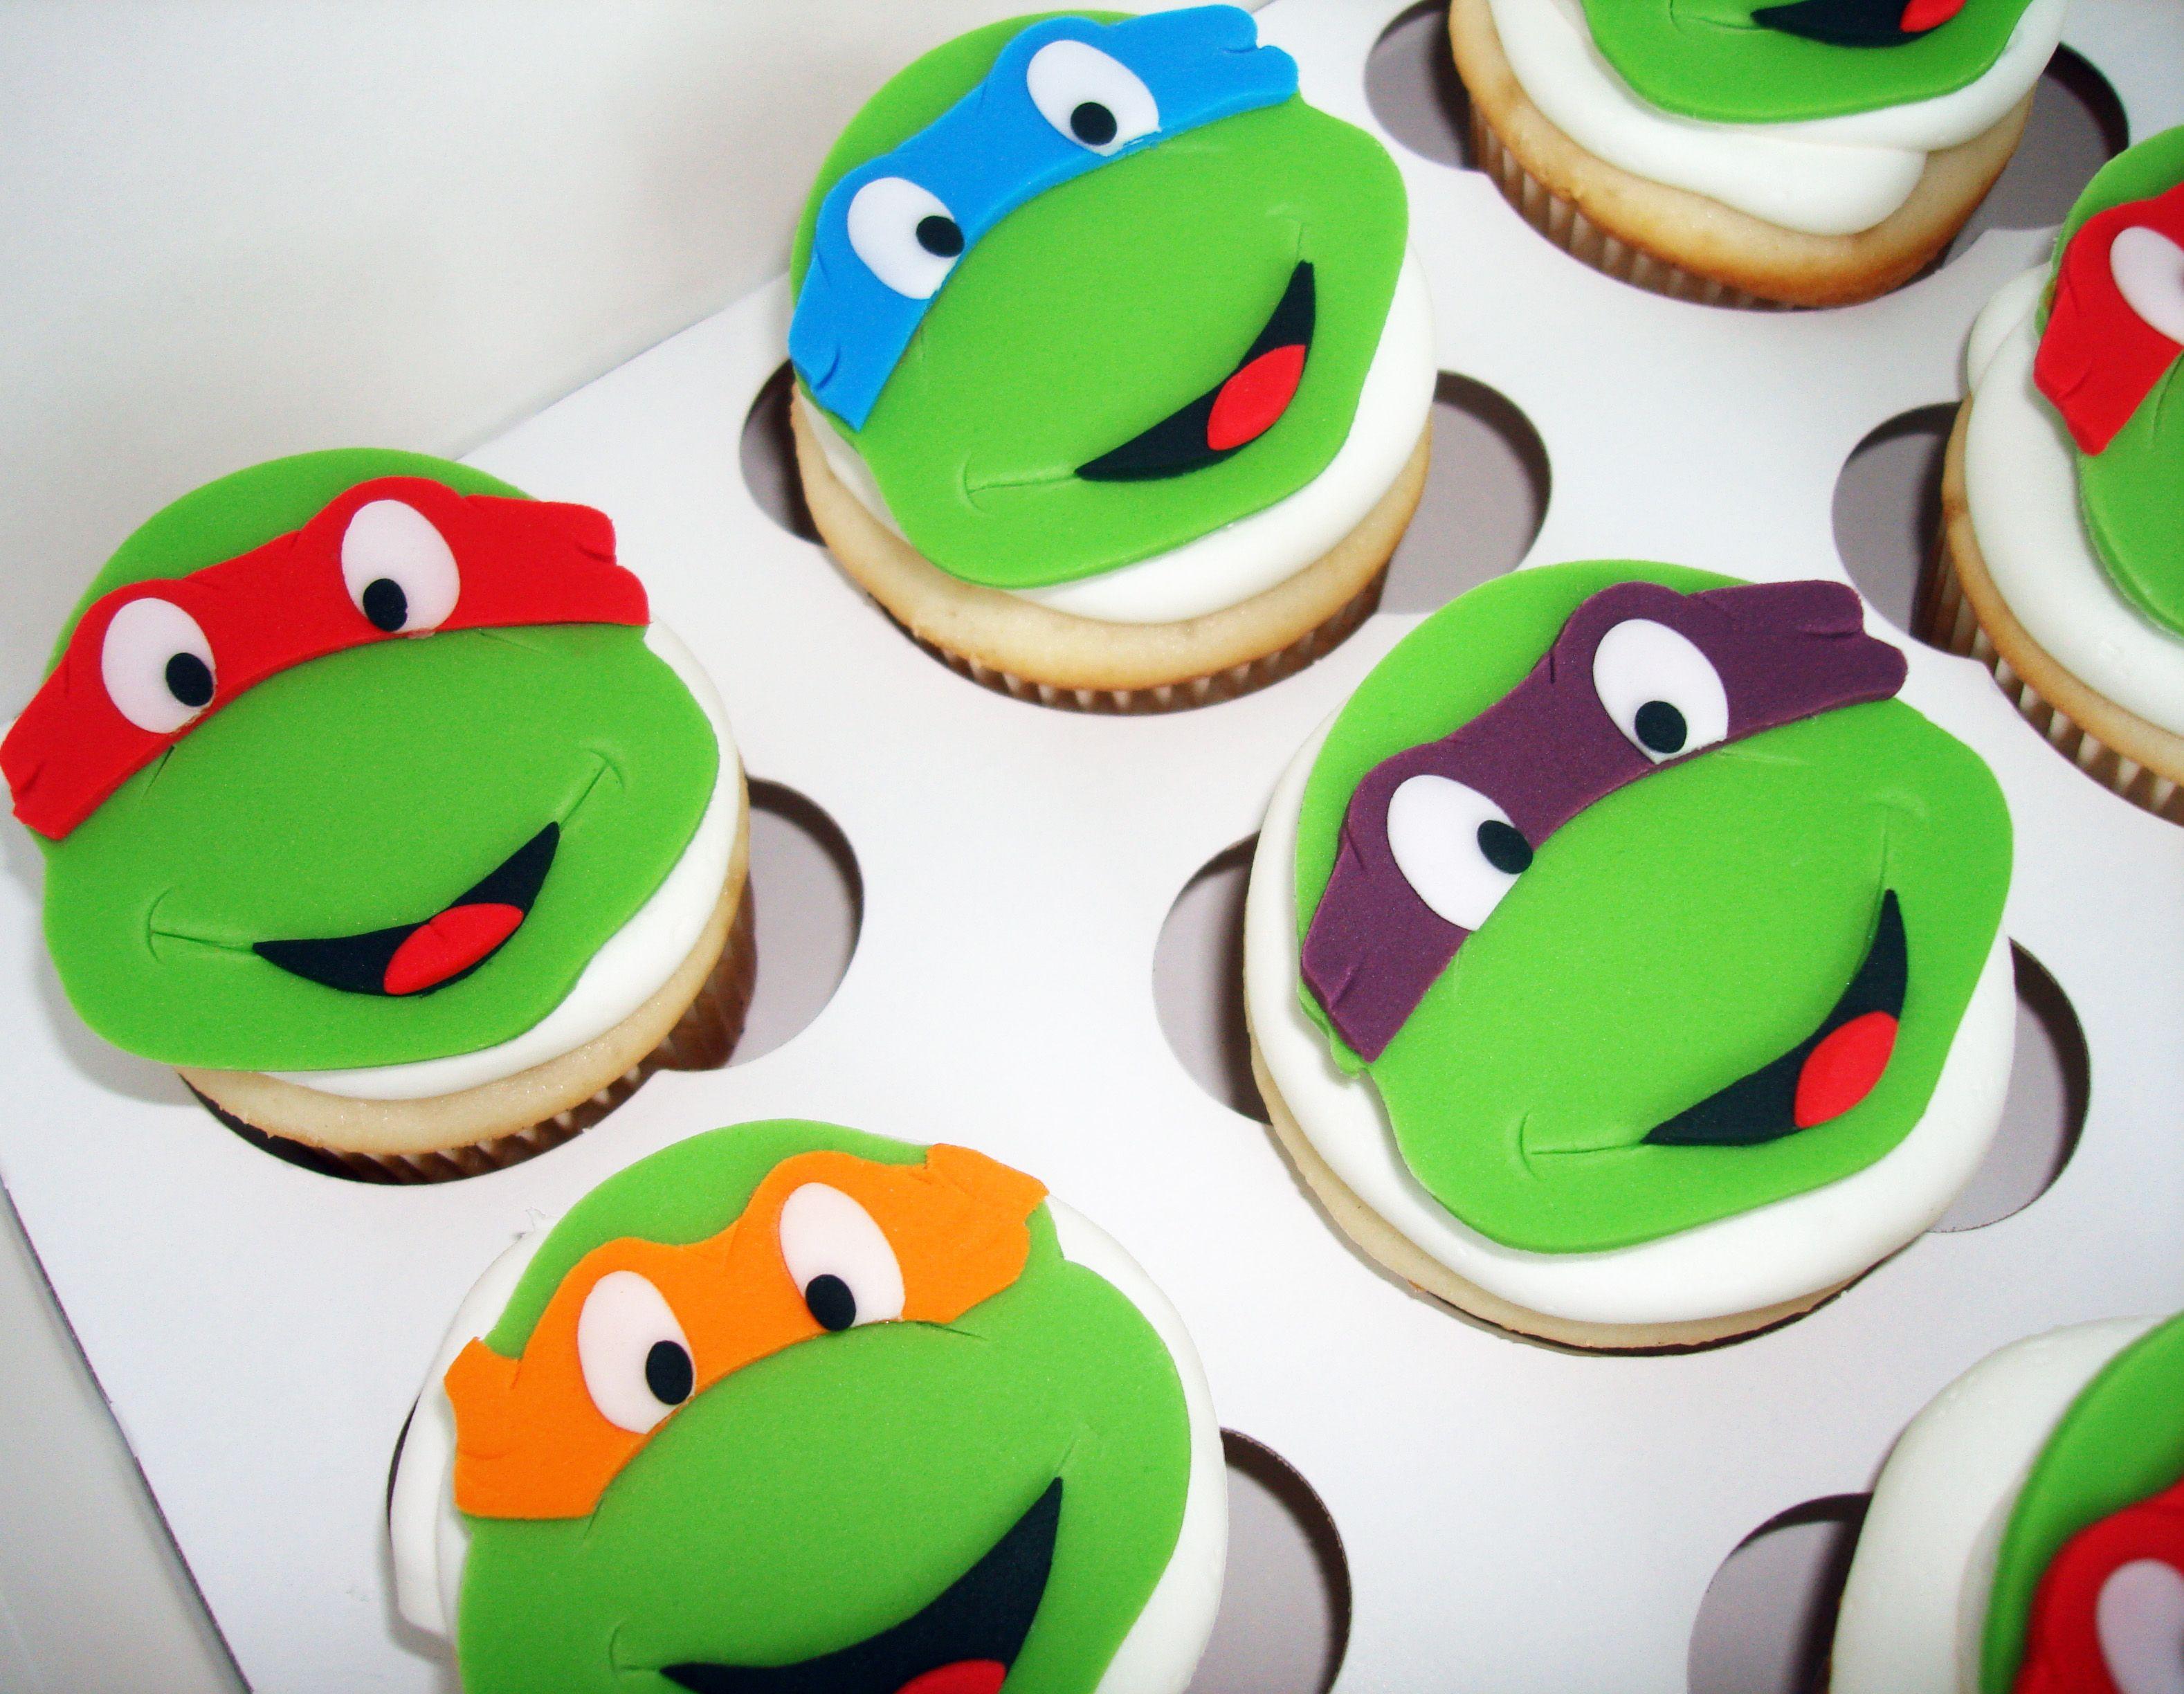 Pin By Becky Pendergraft On Cake Ideas Ninja Turtle Cupcakes Turtle Cupcakes Ninja Turtle Cake